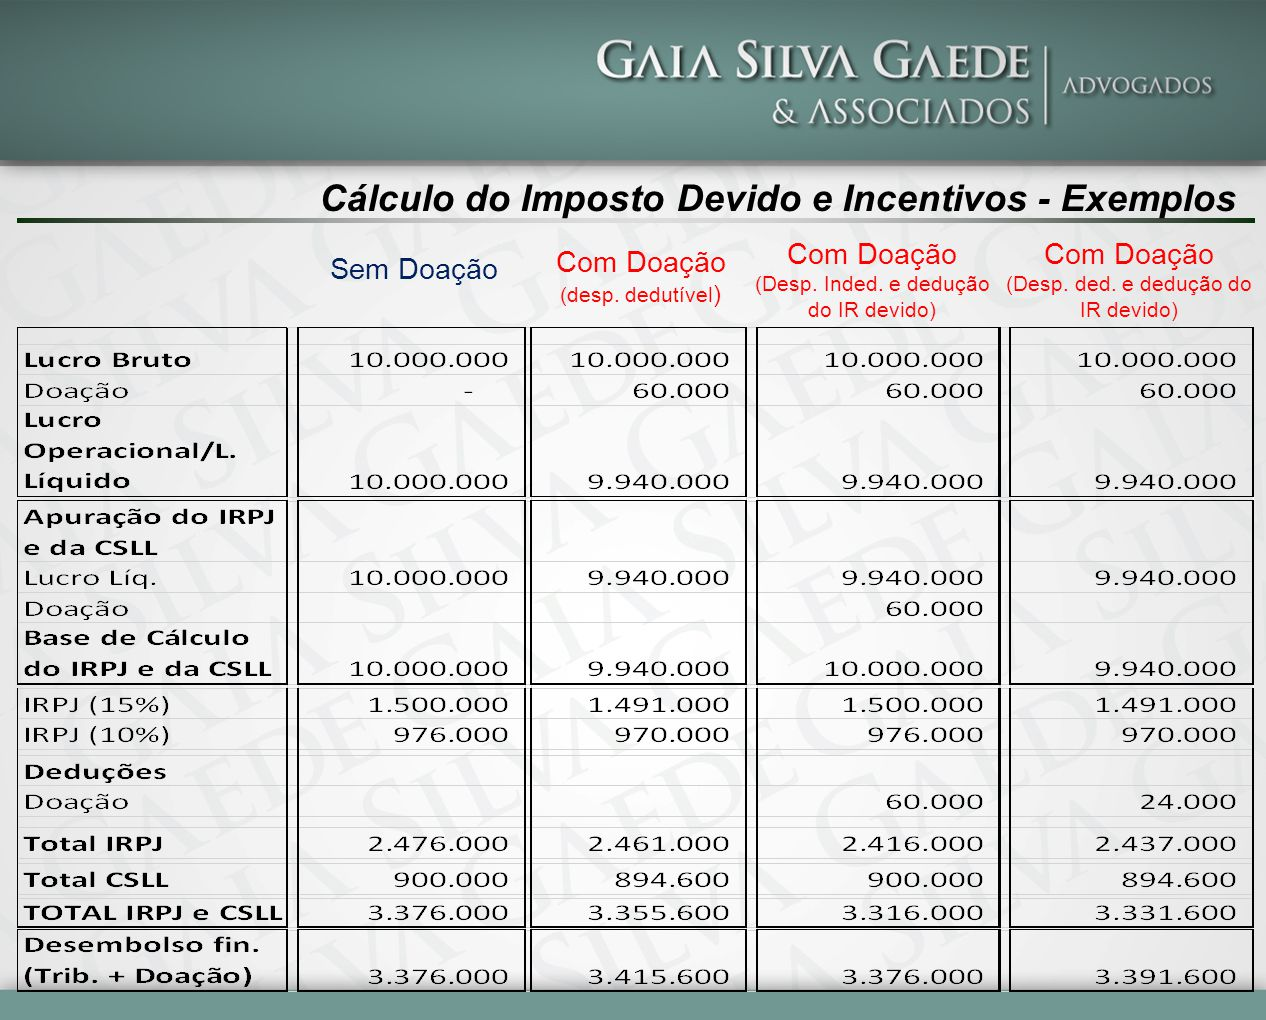 Cálculo do Imposto Devido e Incentivos - Exemplos